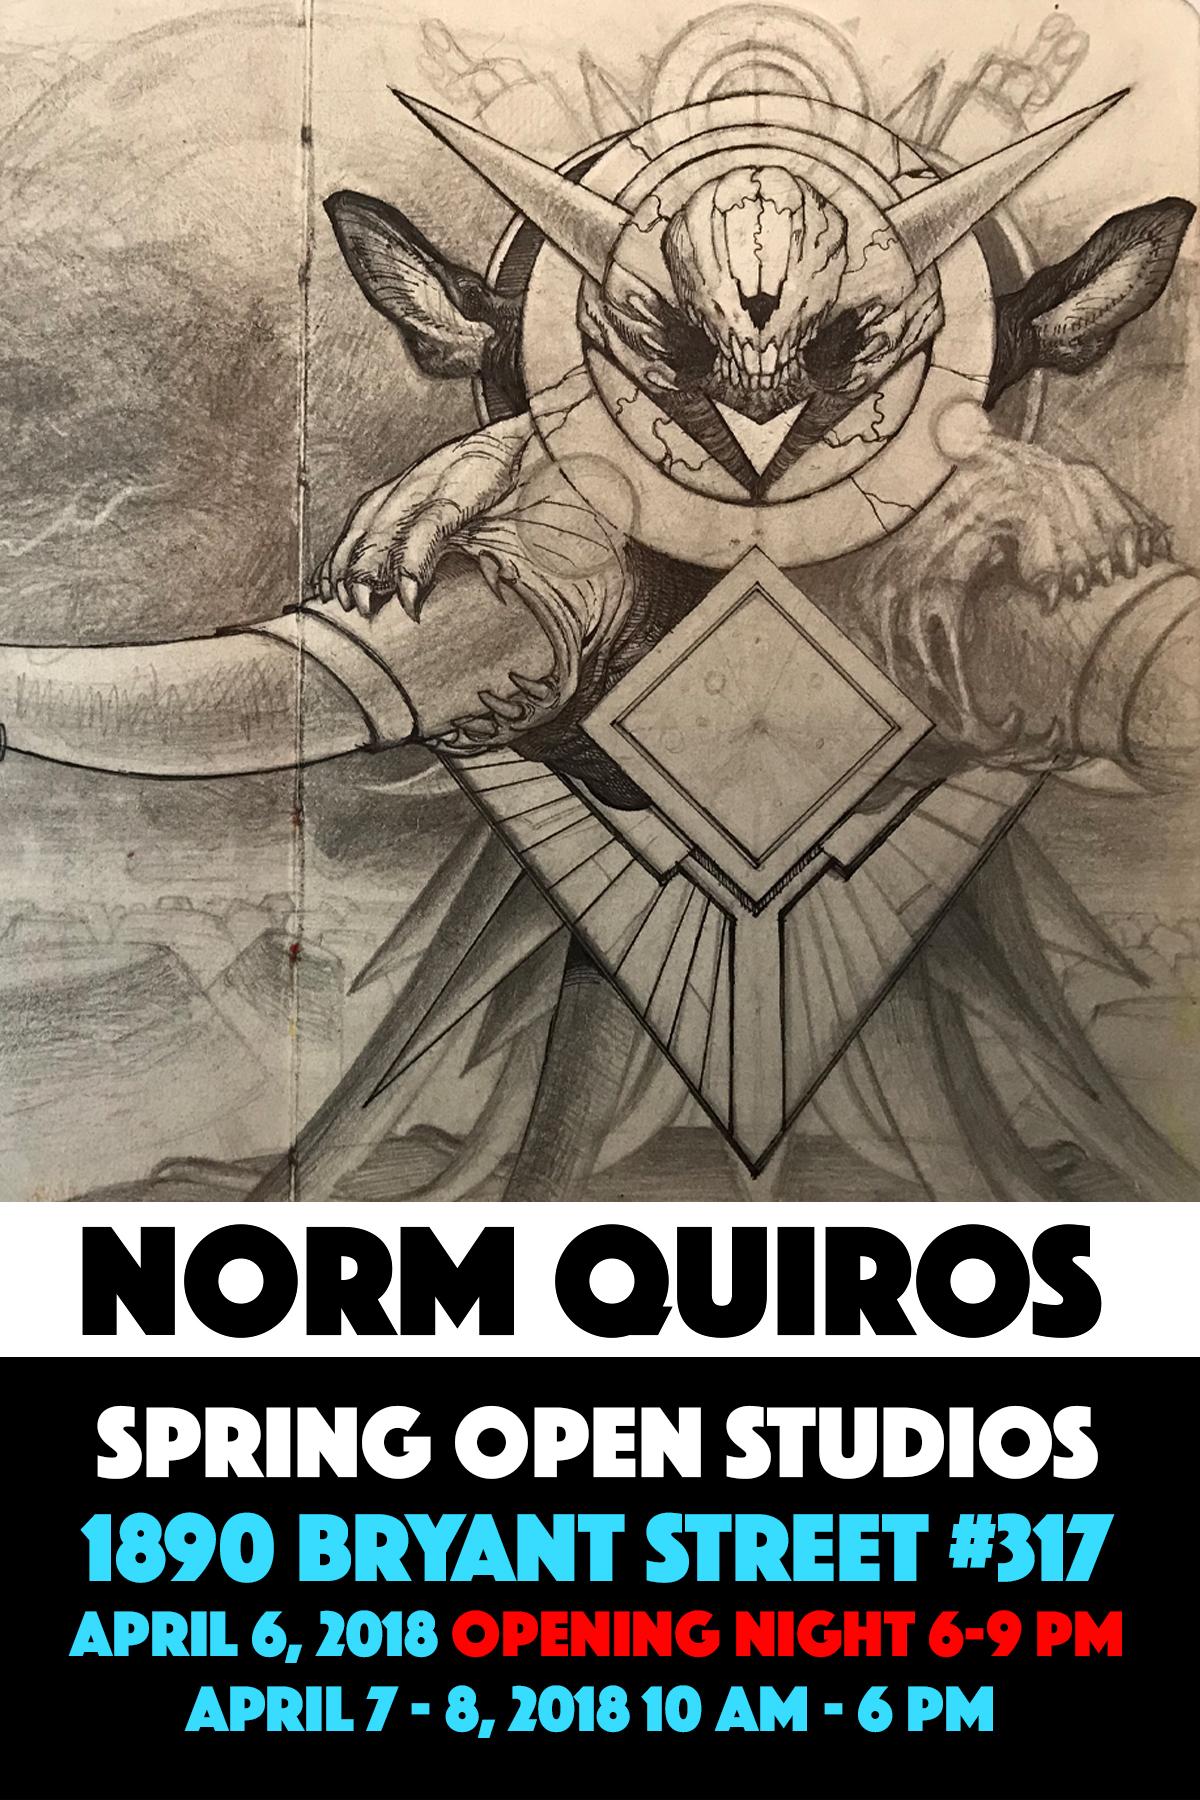 SpringOpenStudios2018.jpg